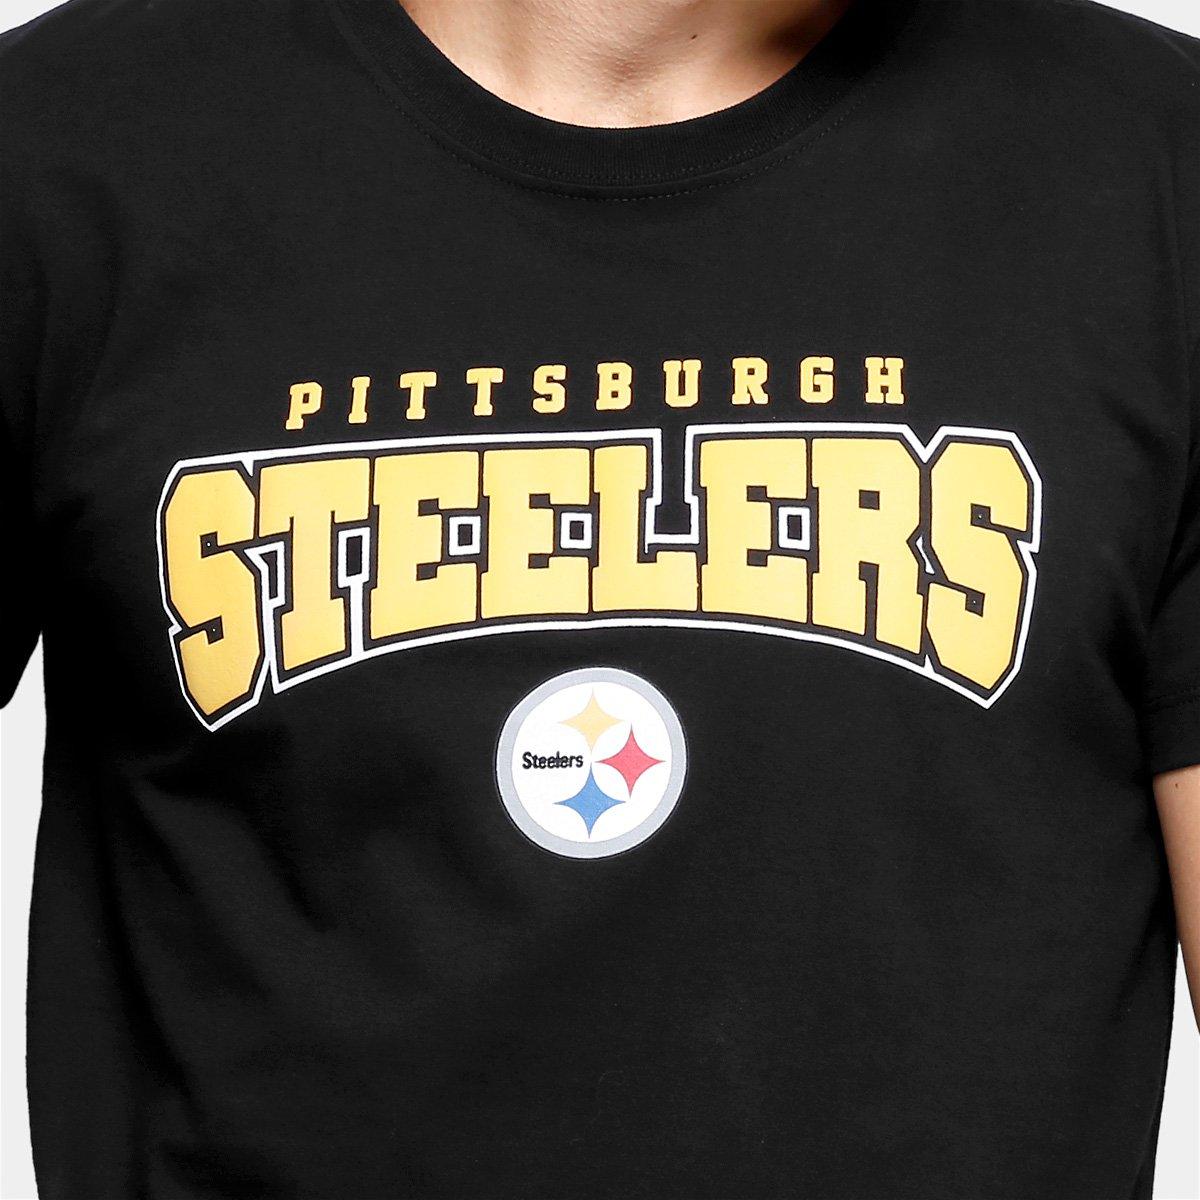 2e0fed3137bed ... Camiseta NFL Pittsburgh Steelers New Era Sports Team Masculina - Preto.  OFERTAS  OPEC